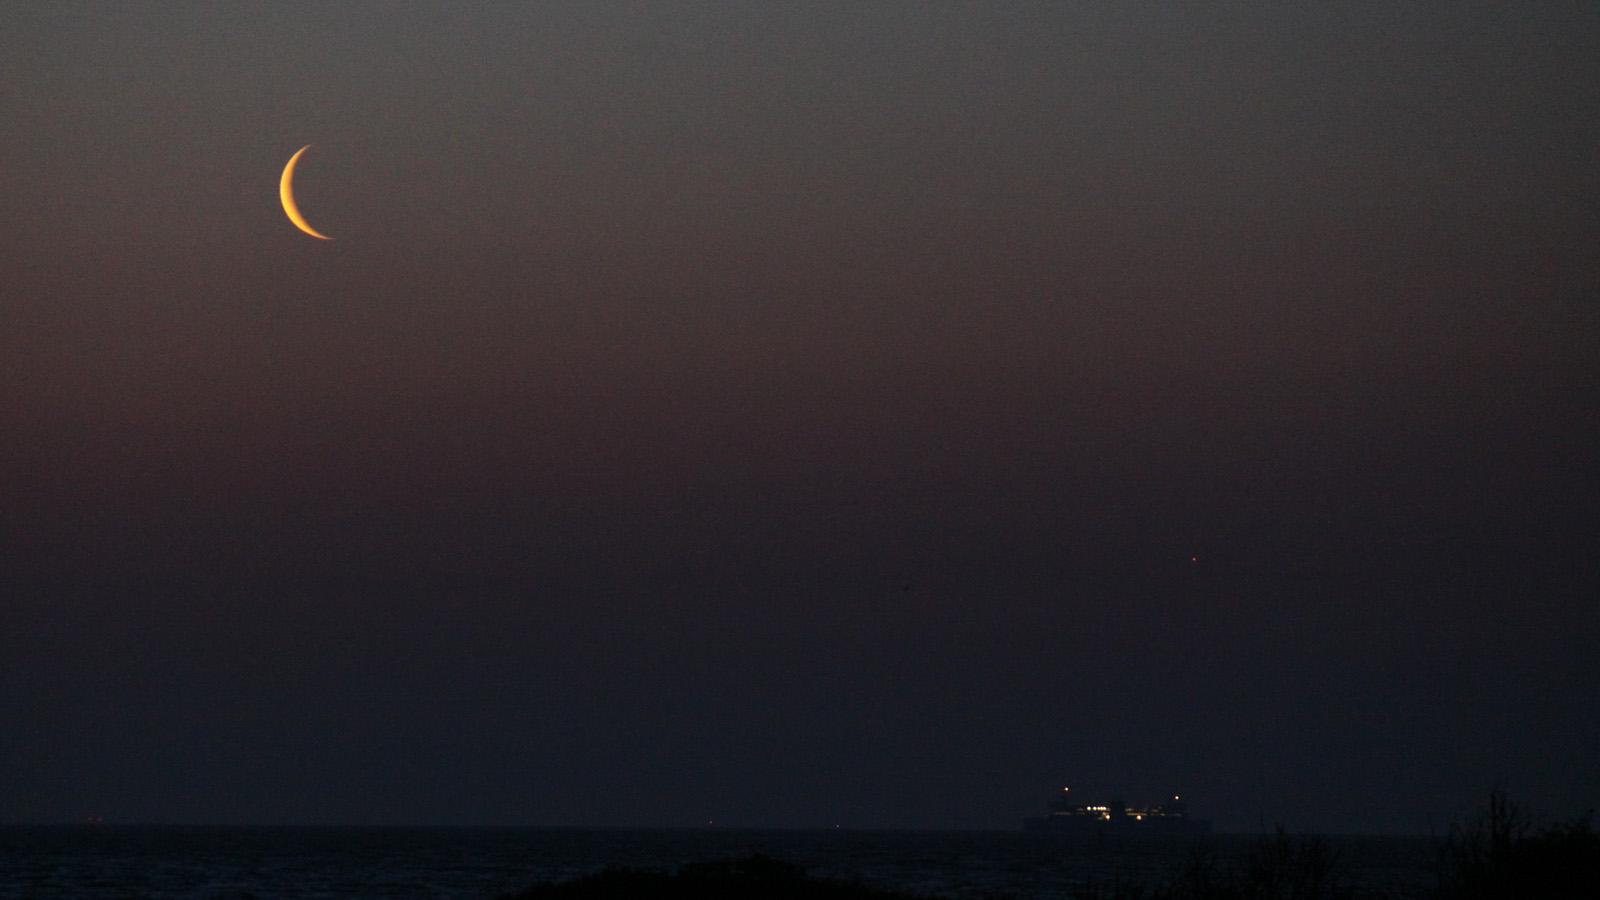 Mond-Venus-Schiff-Fehmarn-TL